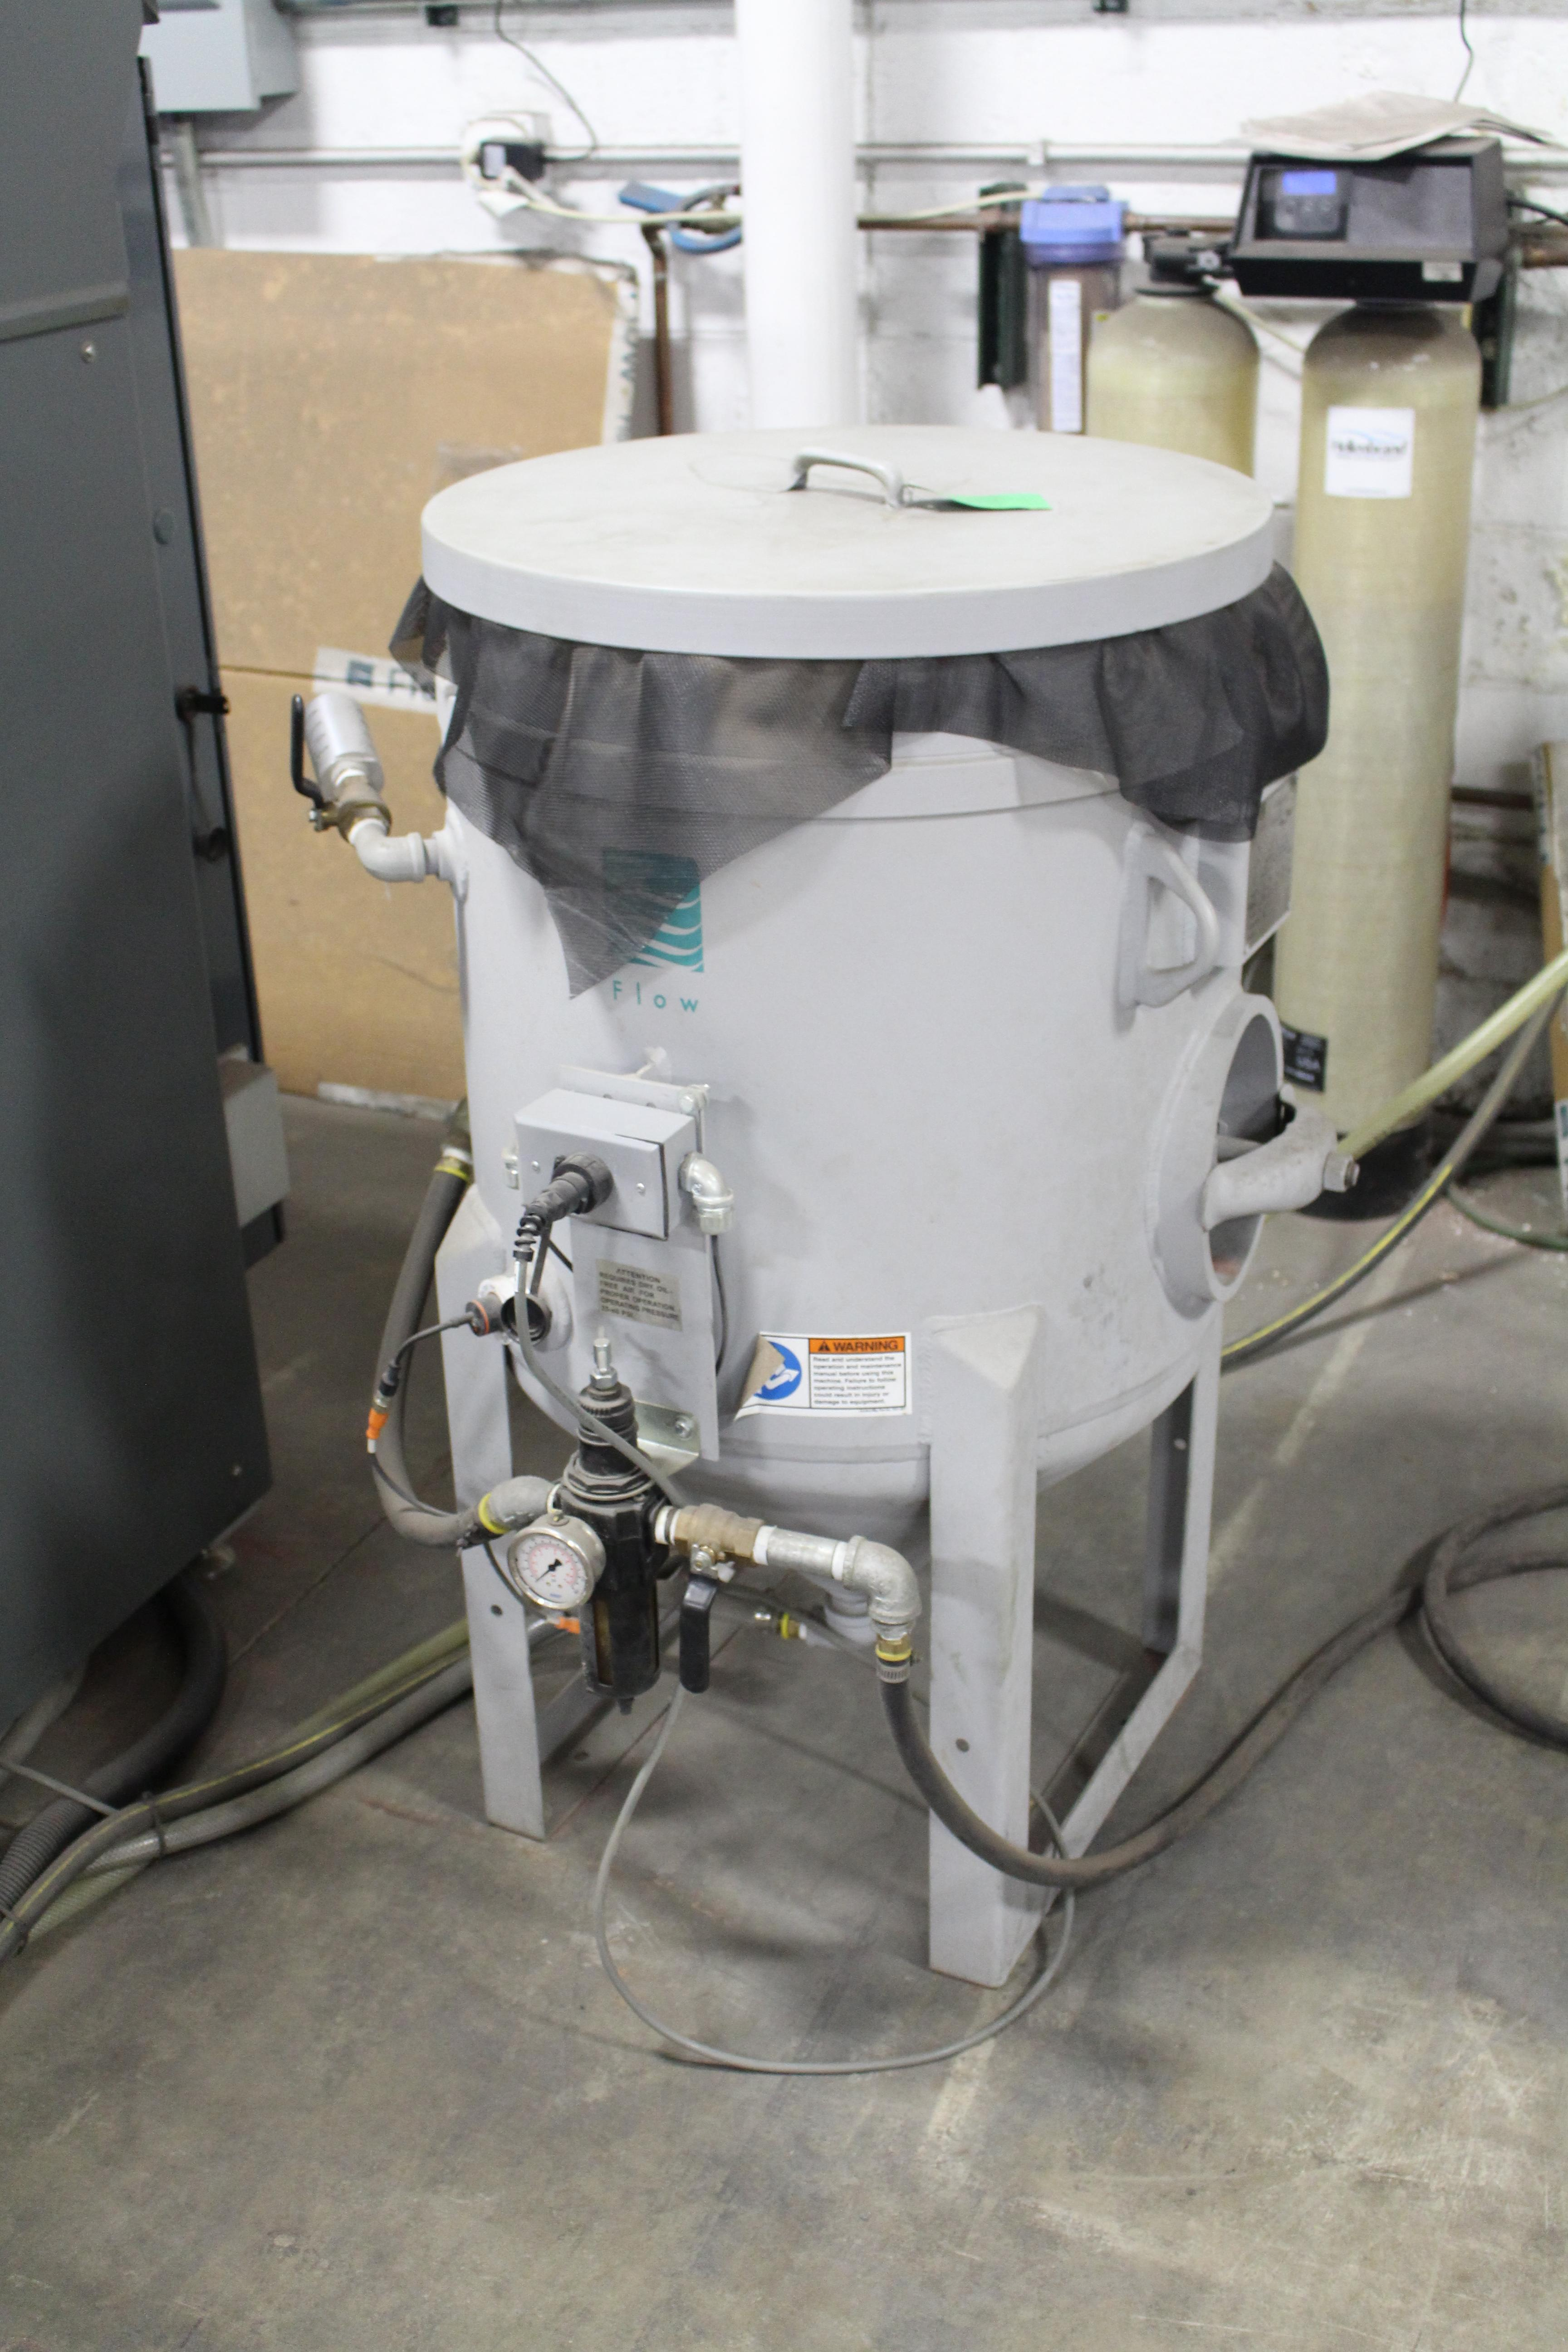 2013 Flow 3020B Mach 3 Dynamic Waterjet System (#2013)